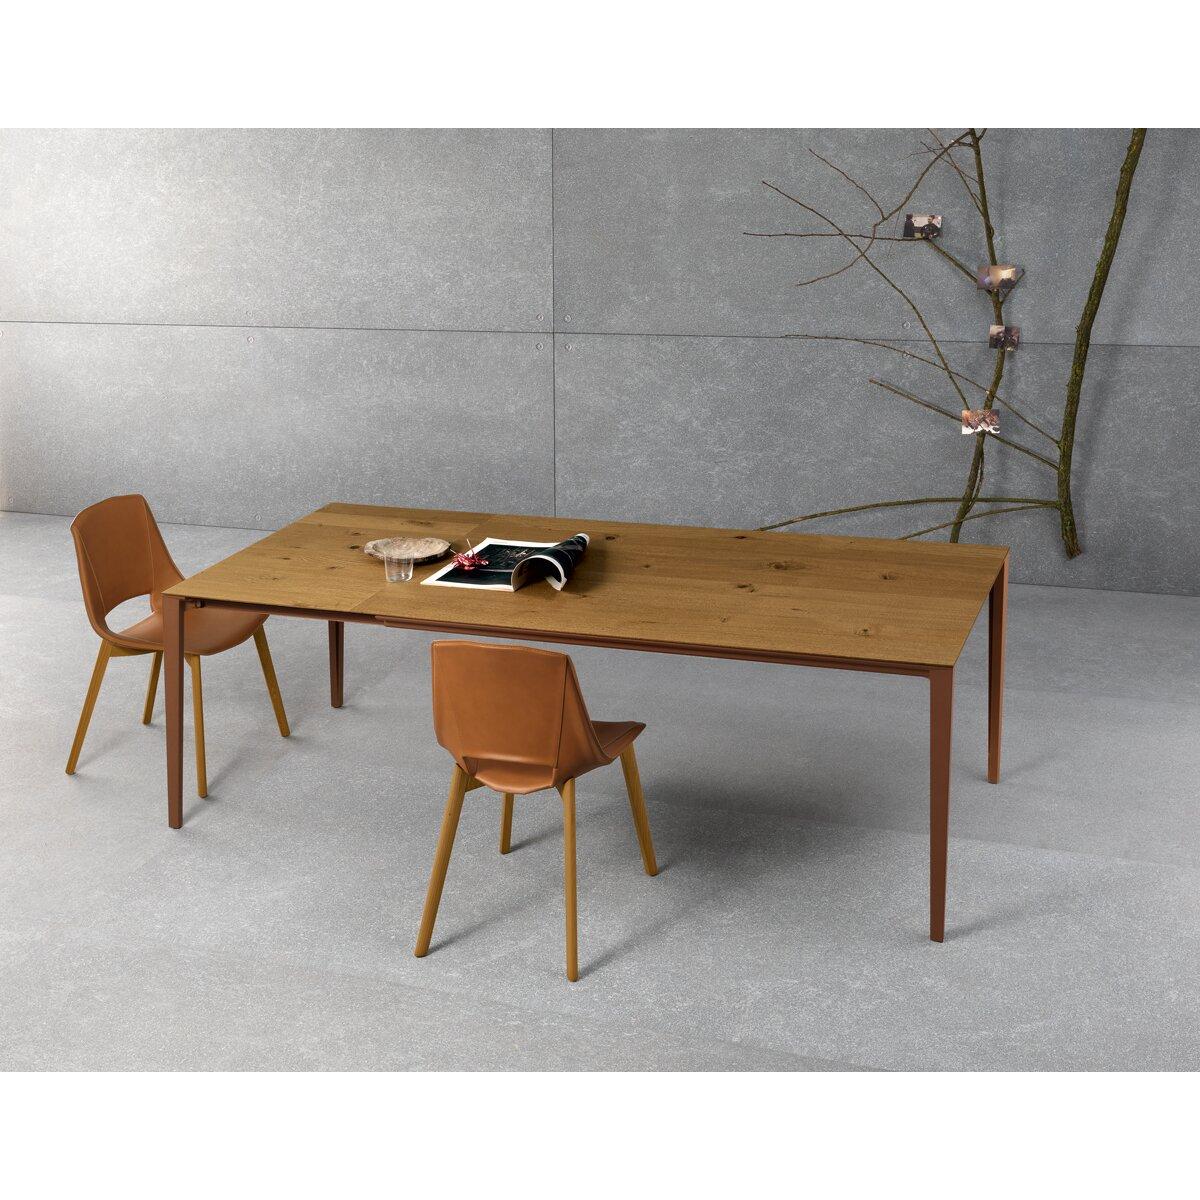 YumanMod Zen Extendable Dining Table Wayfair : ZEN 160 Top Oak Veneered and Legs and Structure Brown Finish SDP010805 from www.wayfair.com size 1200 x 1200 jpeg 324kB